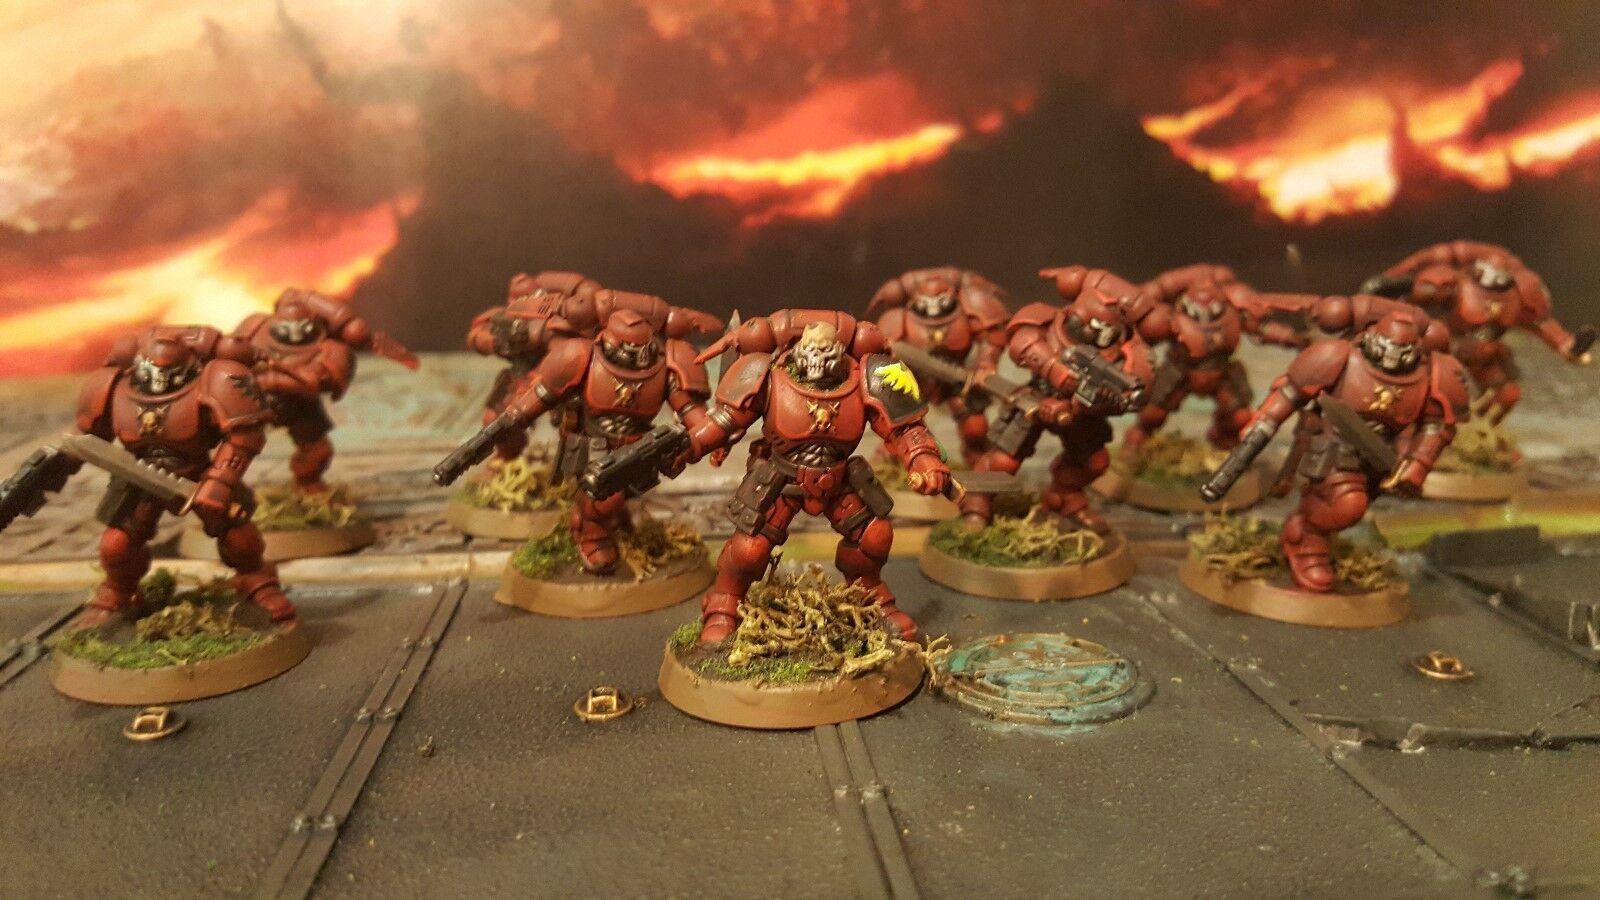 Warhammer Primaris space marine 10 man Reivers pro painted made to order